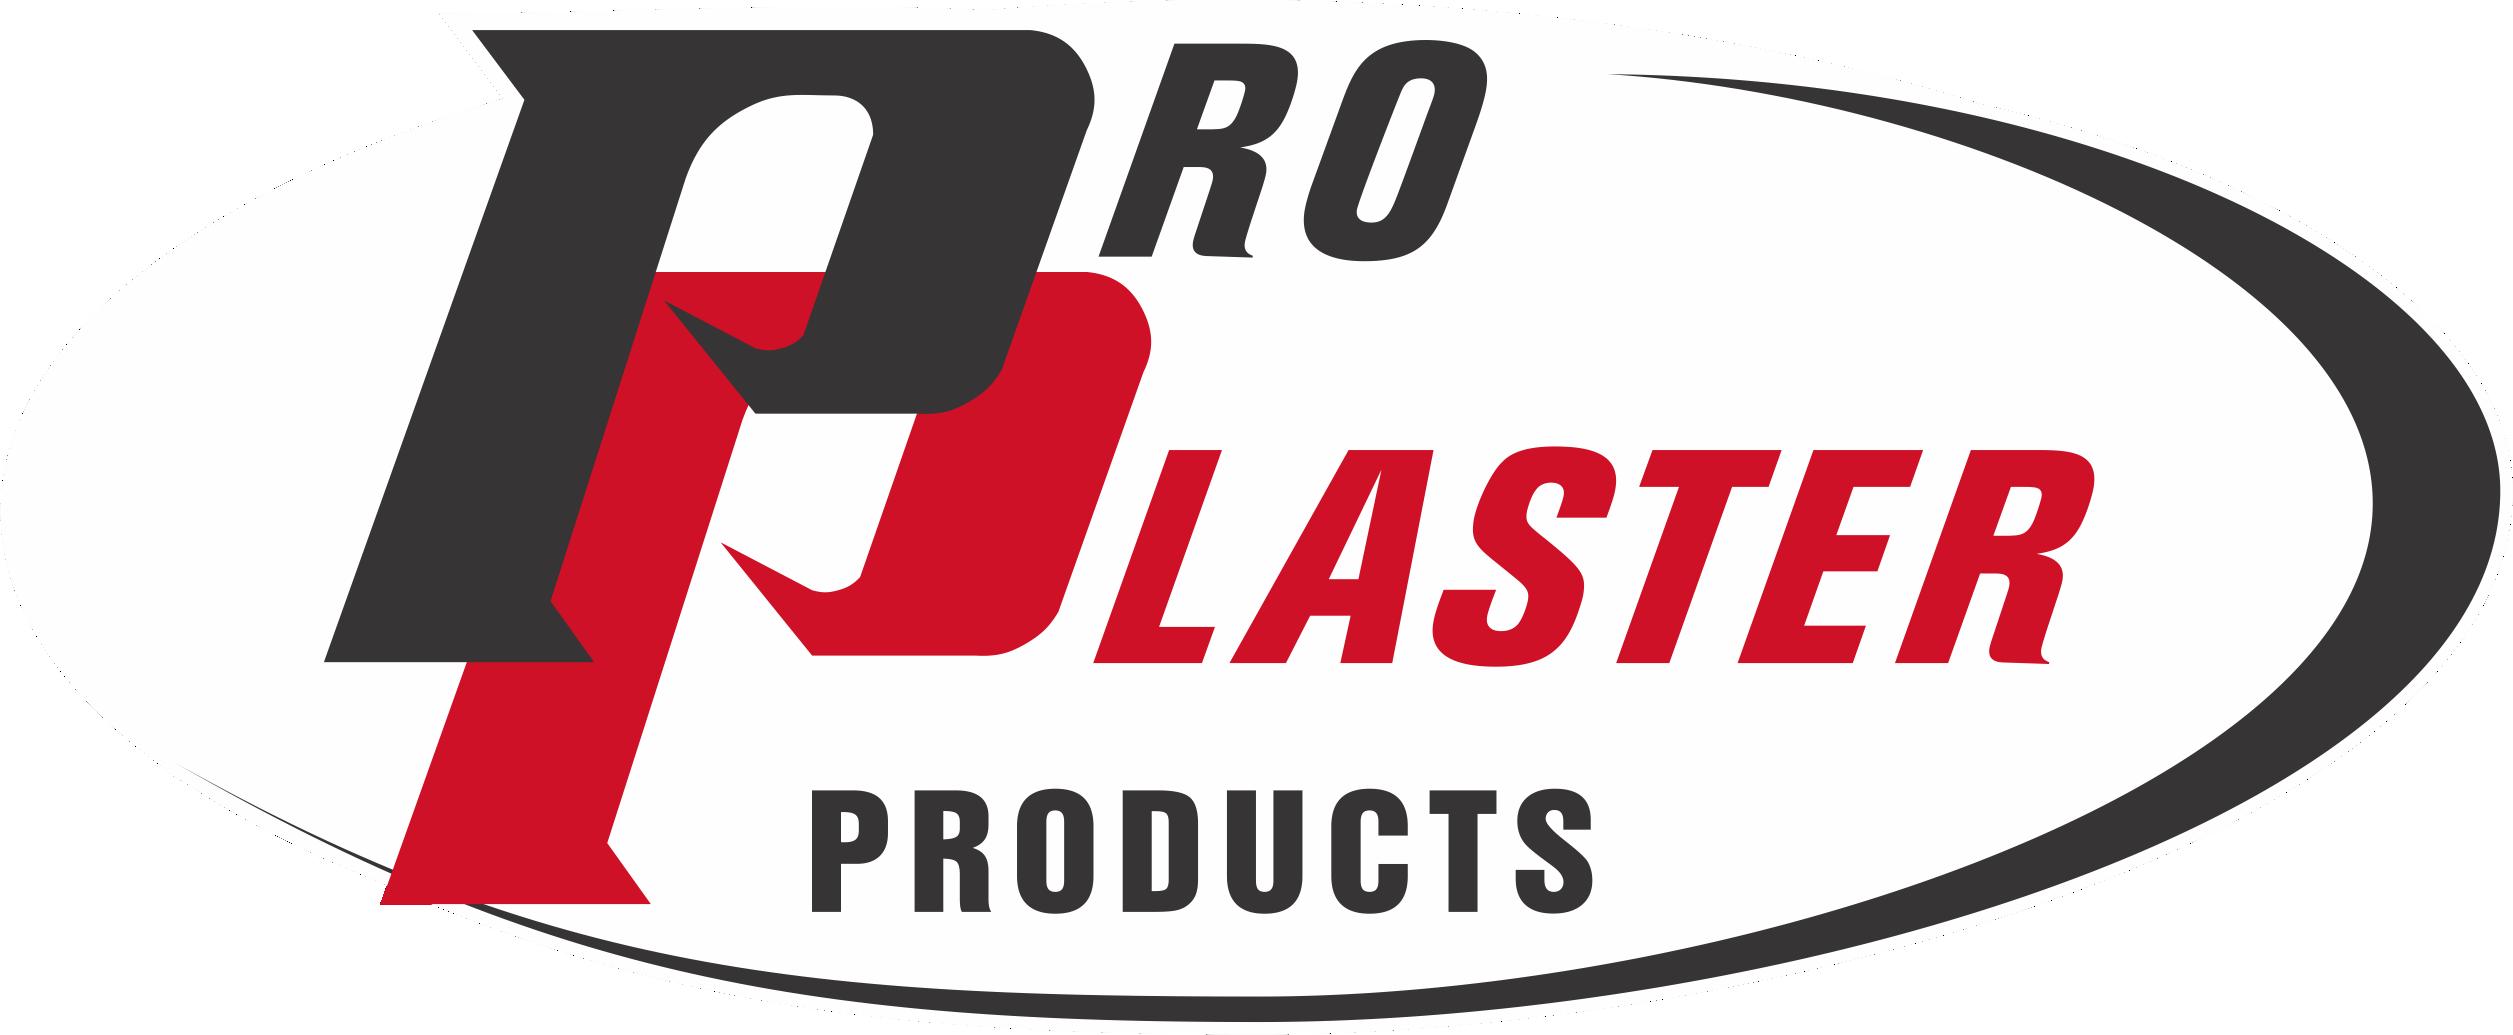 Pro Plaster Logo.png